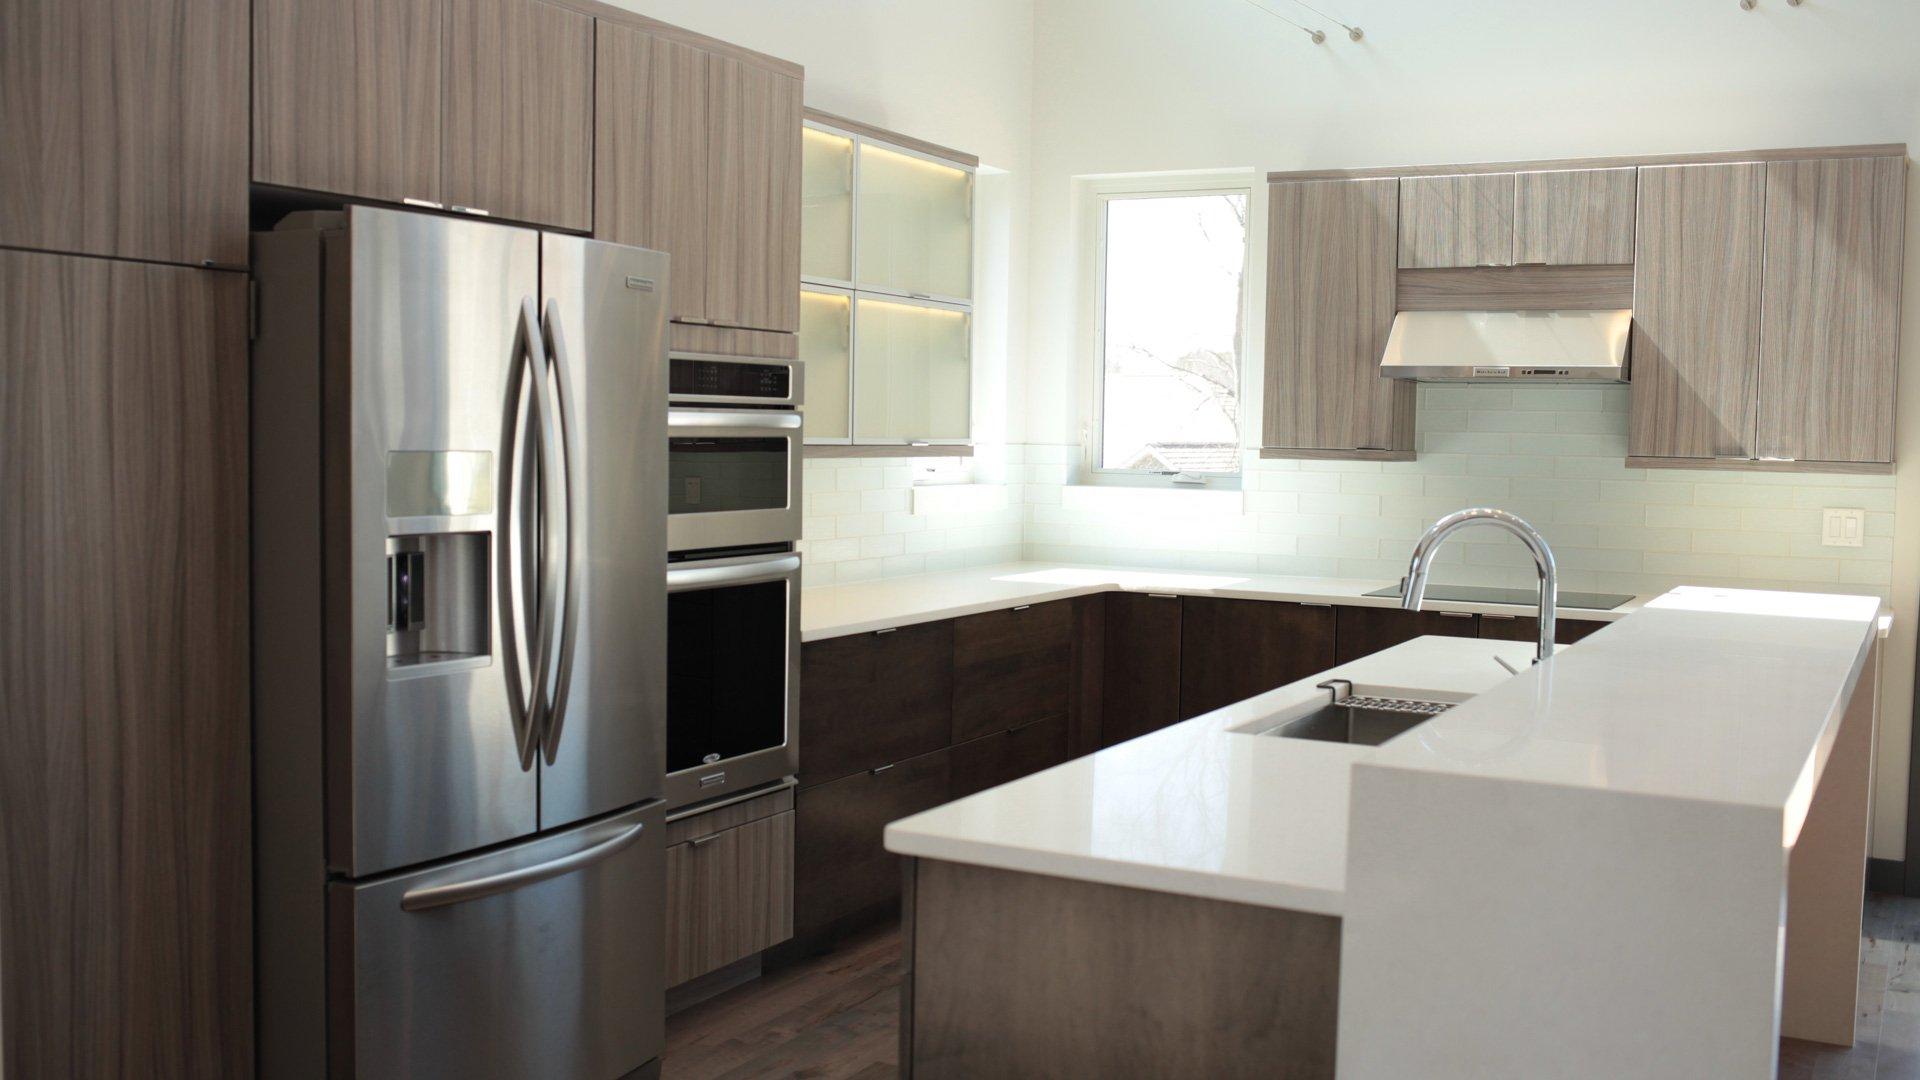 H&H Home Builders Interior Design Image #68